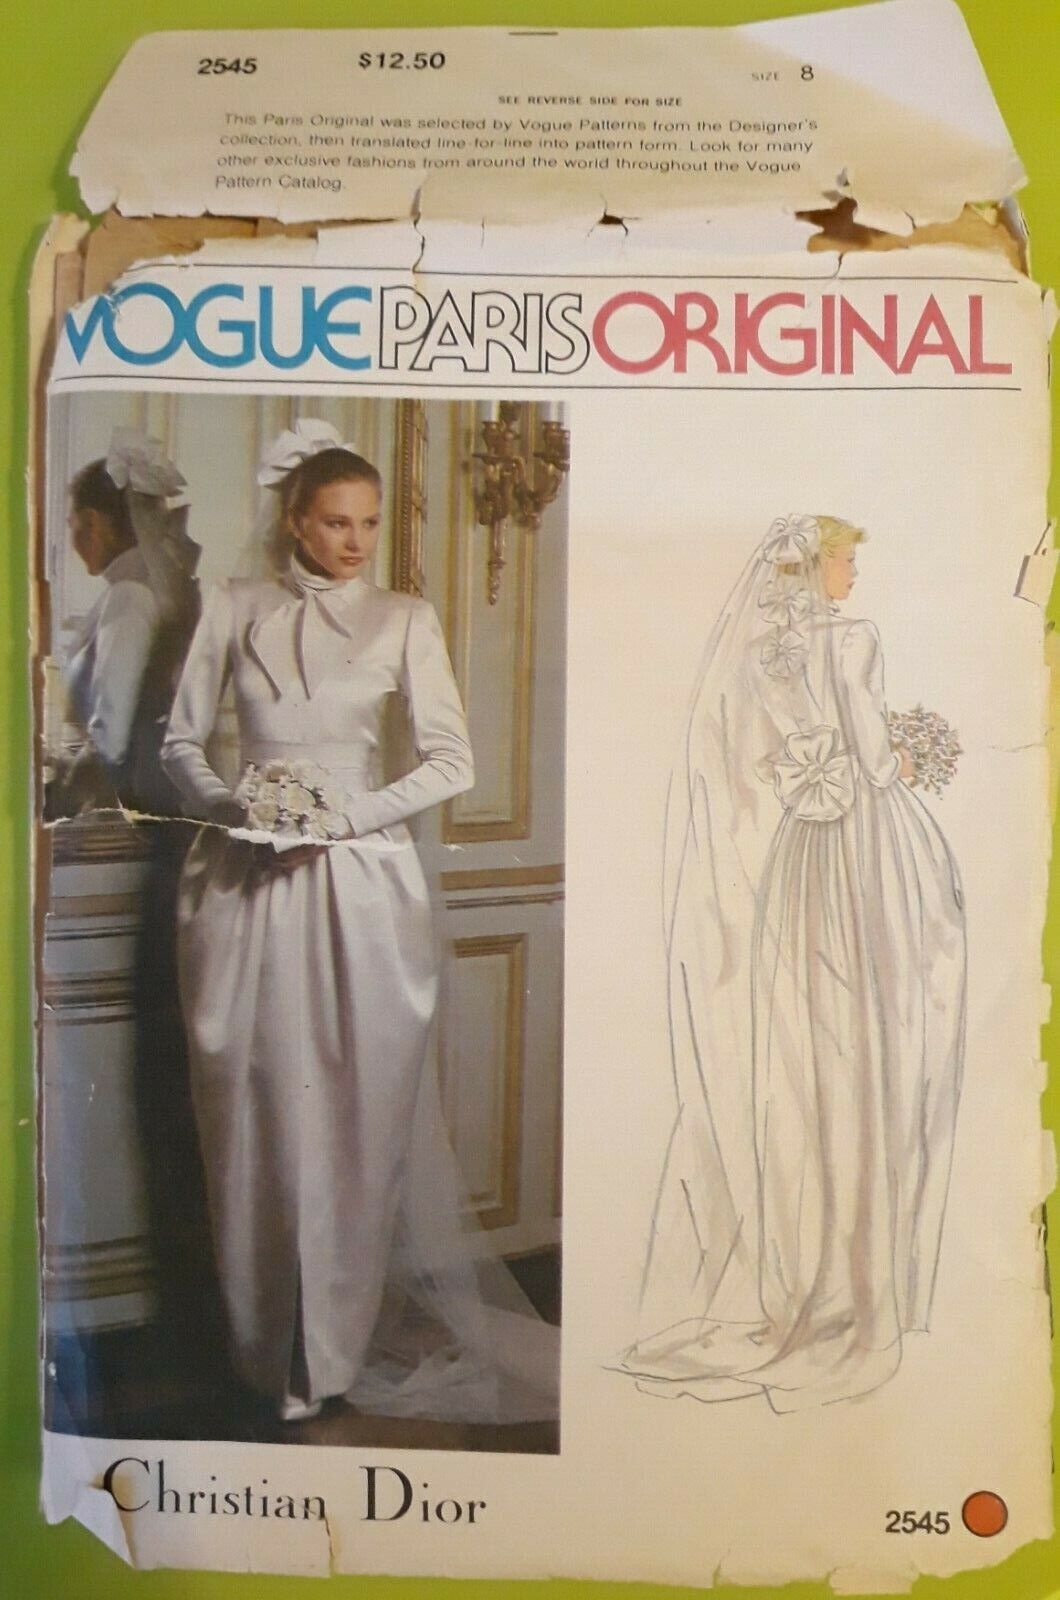 Vogue paris original, patron robe de mariée christian dior, t.8